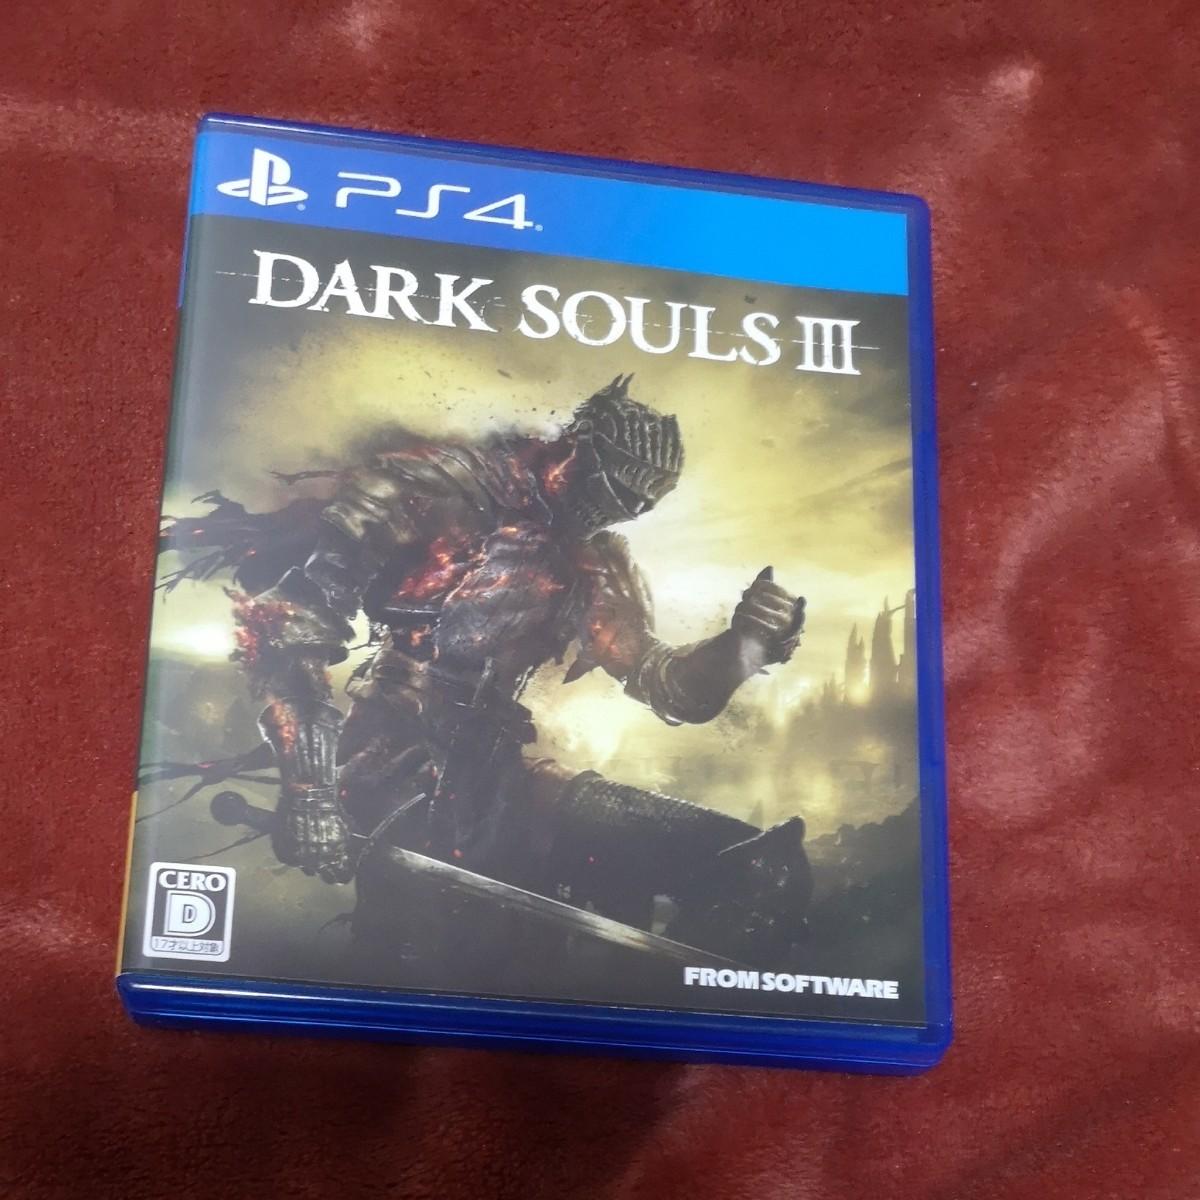 PS4ソフト ダークソウル3 DARK SOULS DARK SOULS III